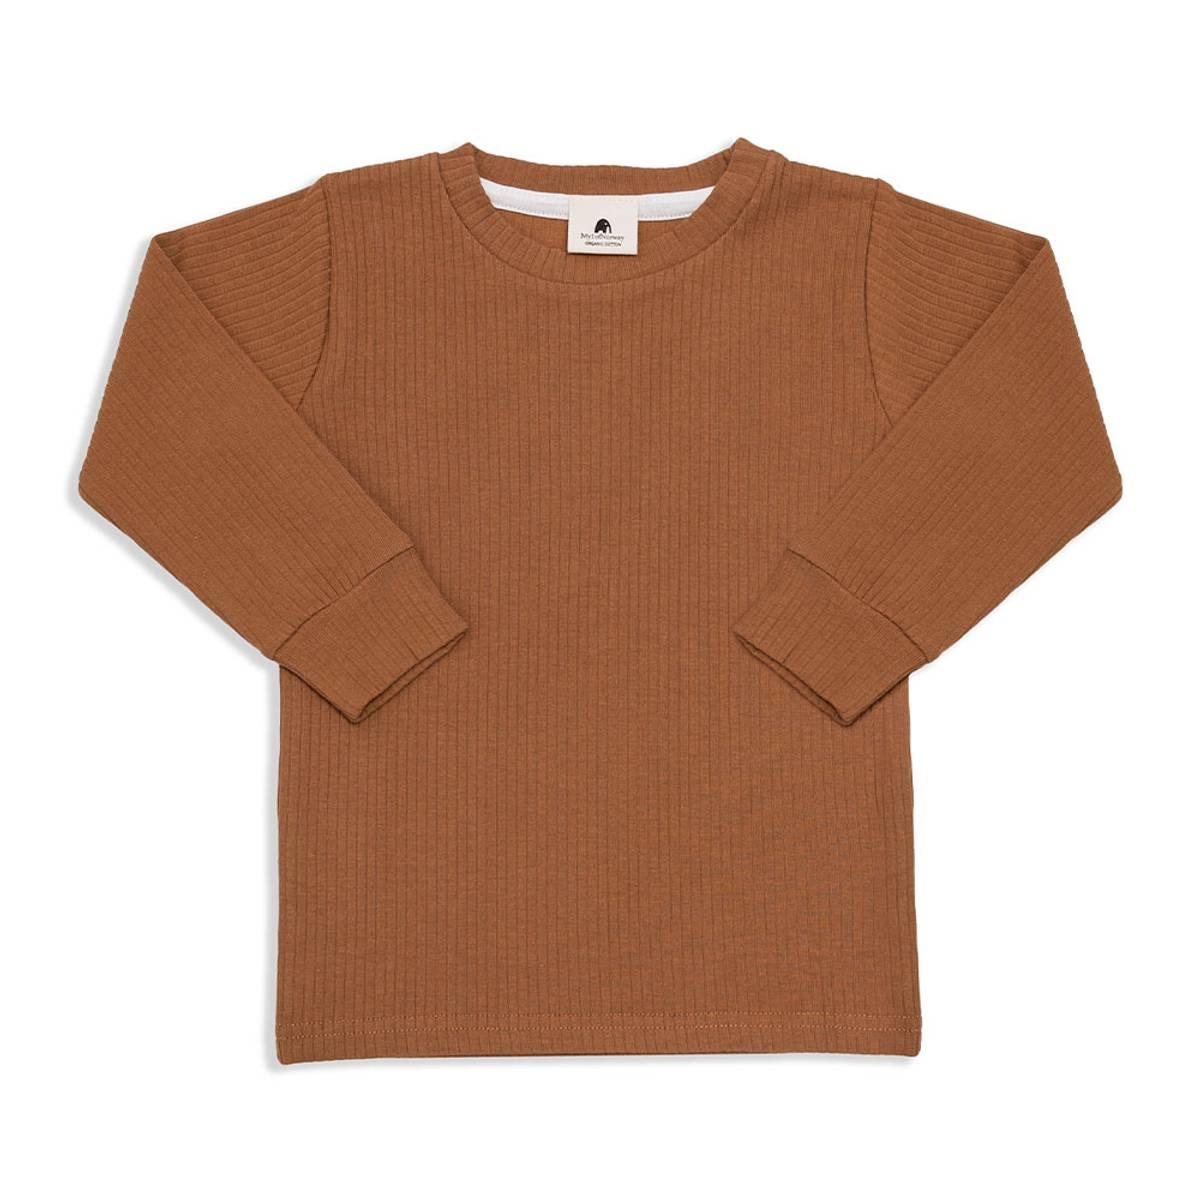 My1 Comfy - Rust